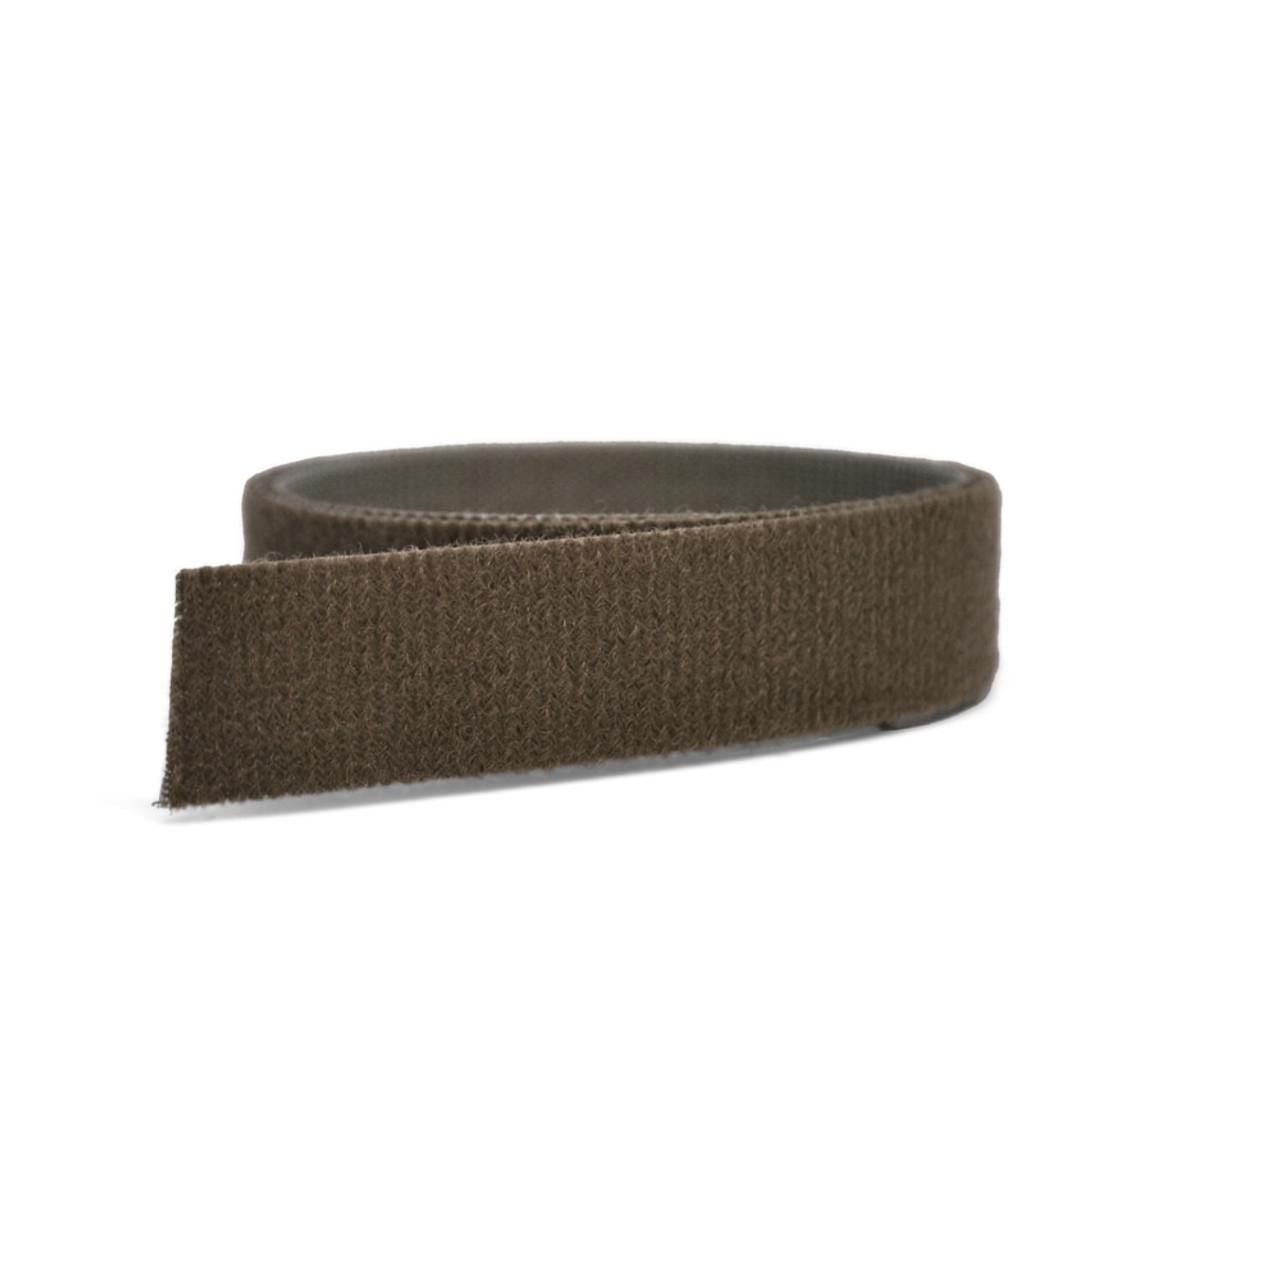 VELCRO® ONE-WRAP® Tape - Brown / Velcro Straps - Bundling Straps - Velcro Tie - Velcro Strap